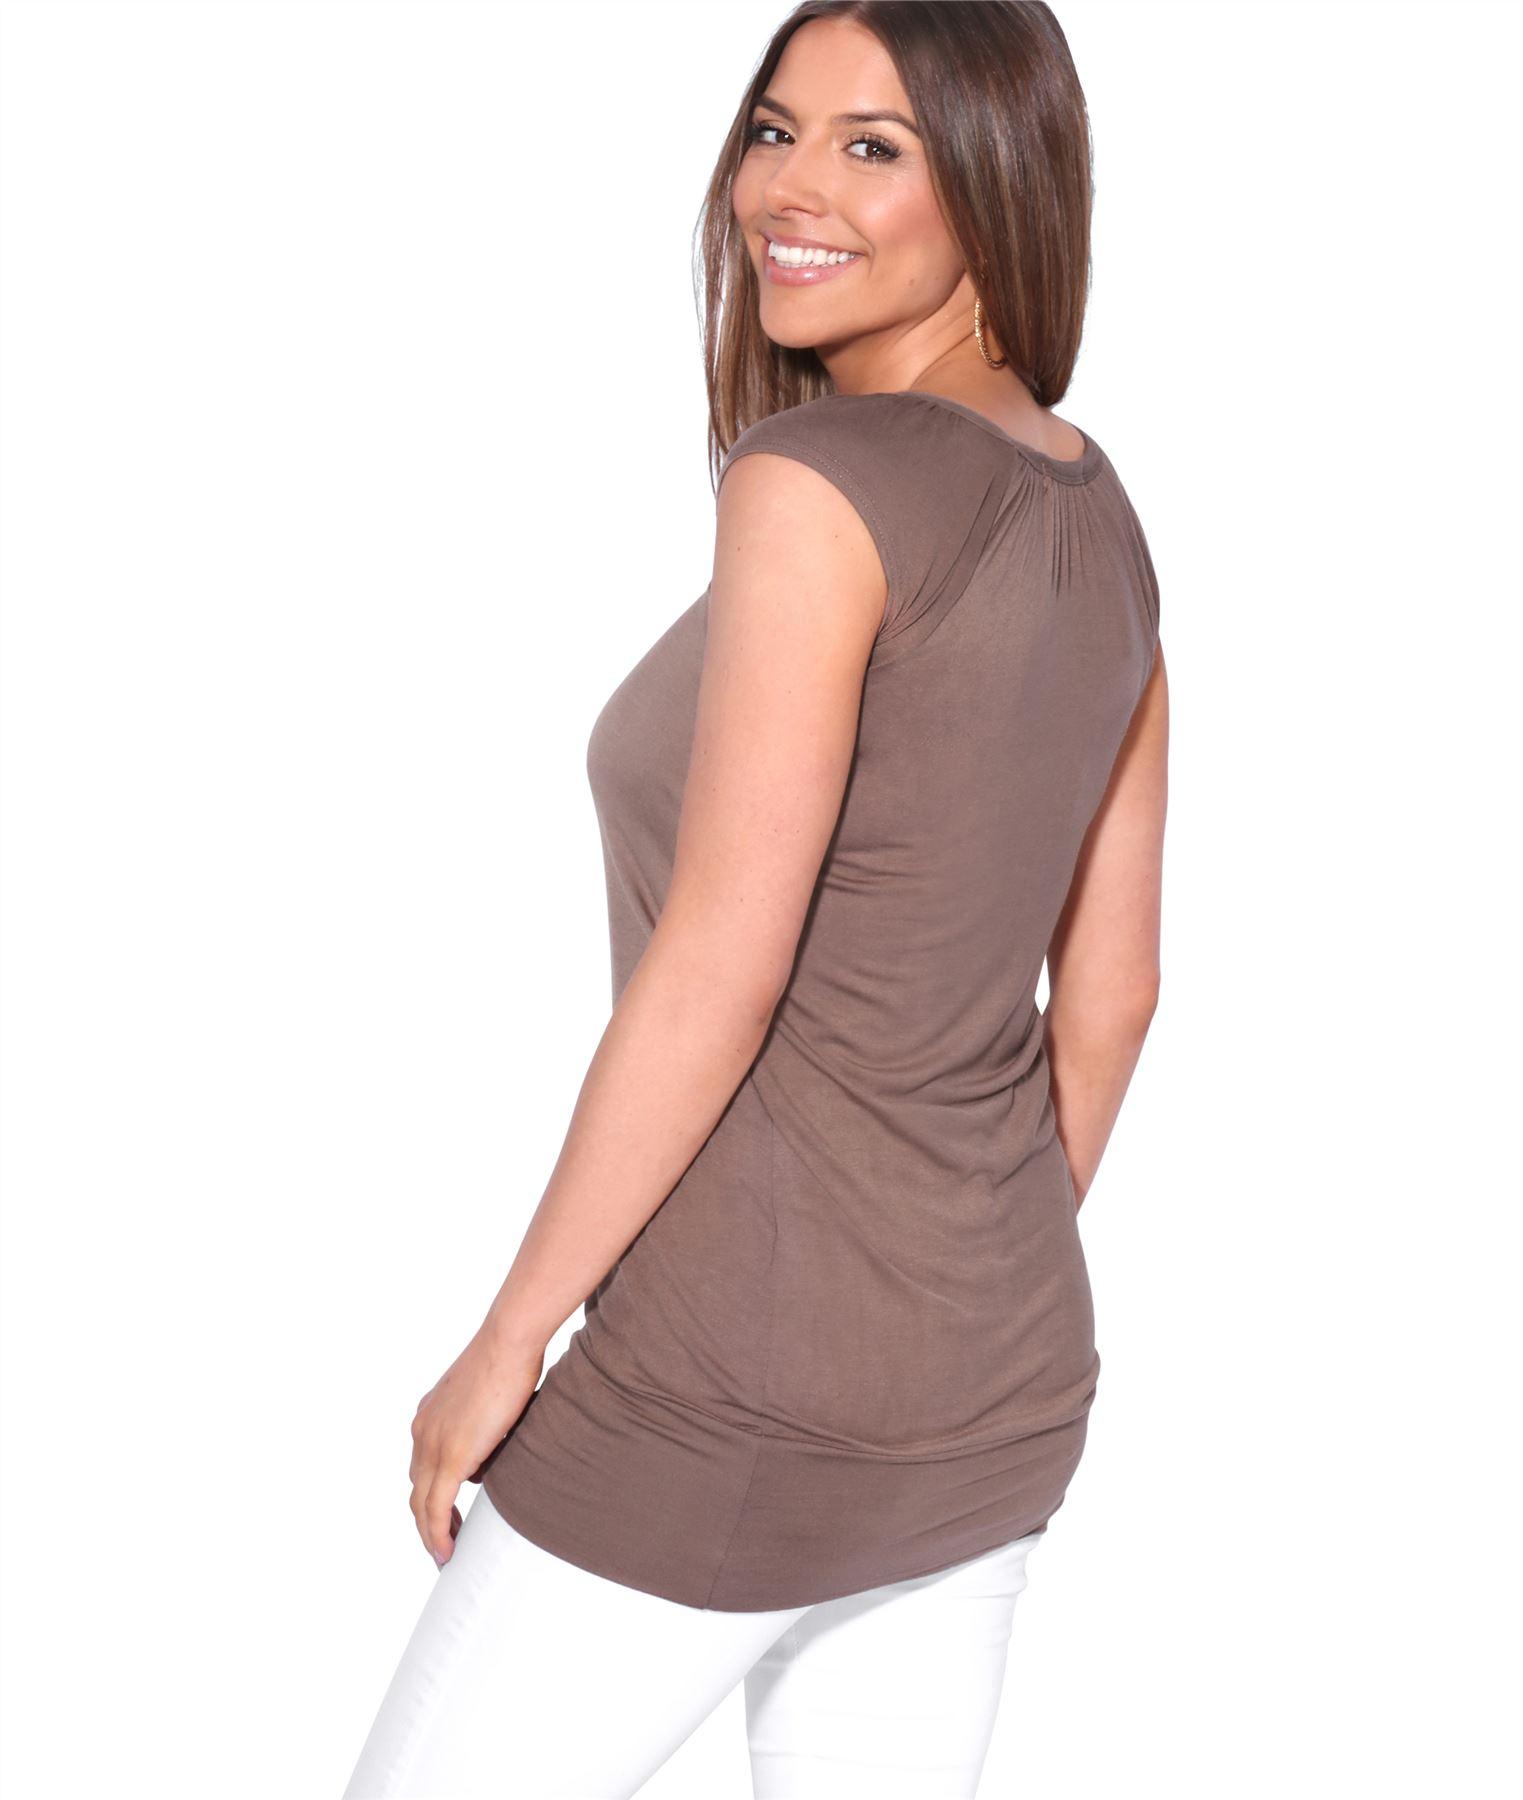 Womens-Ladies-Plain-T-Shirt-Short-Sleeve-Long-Loose-V-Neck-Blouse-Tunic-Top thumbnail 28